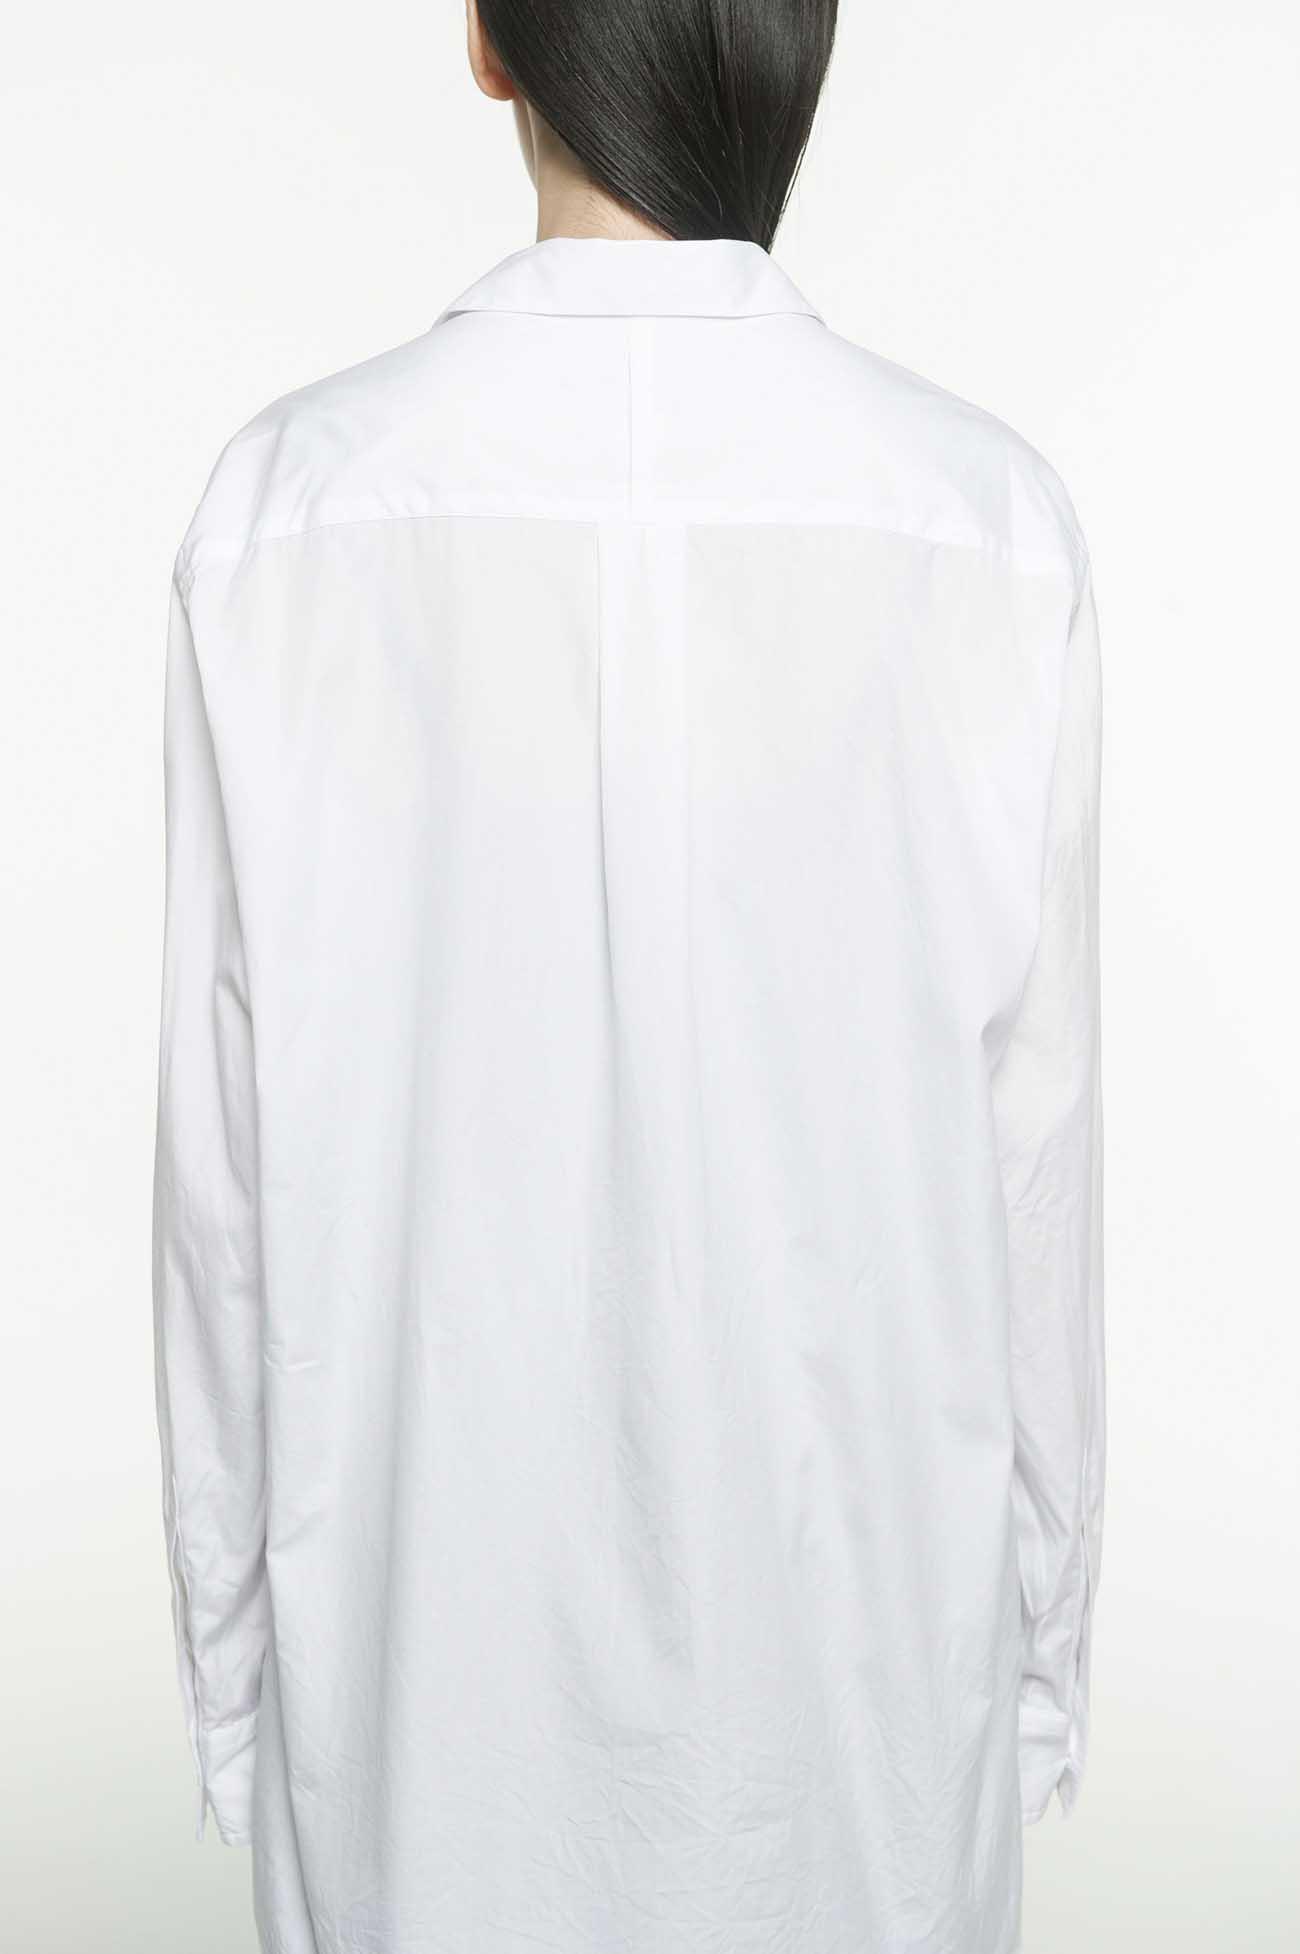 100/2 Broad「Into The Future.」Y・Y Message Open Collar Shirt